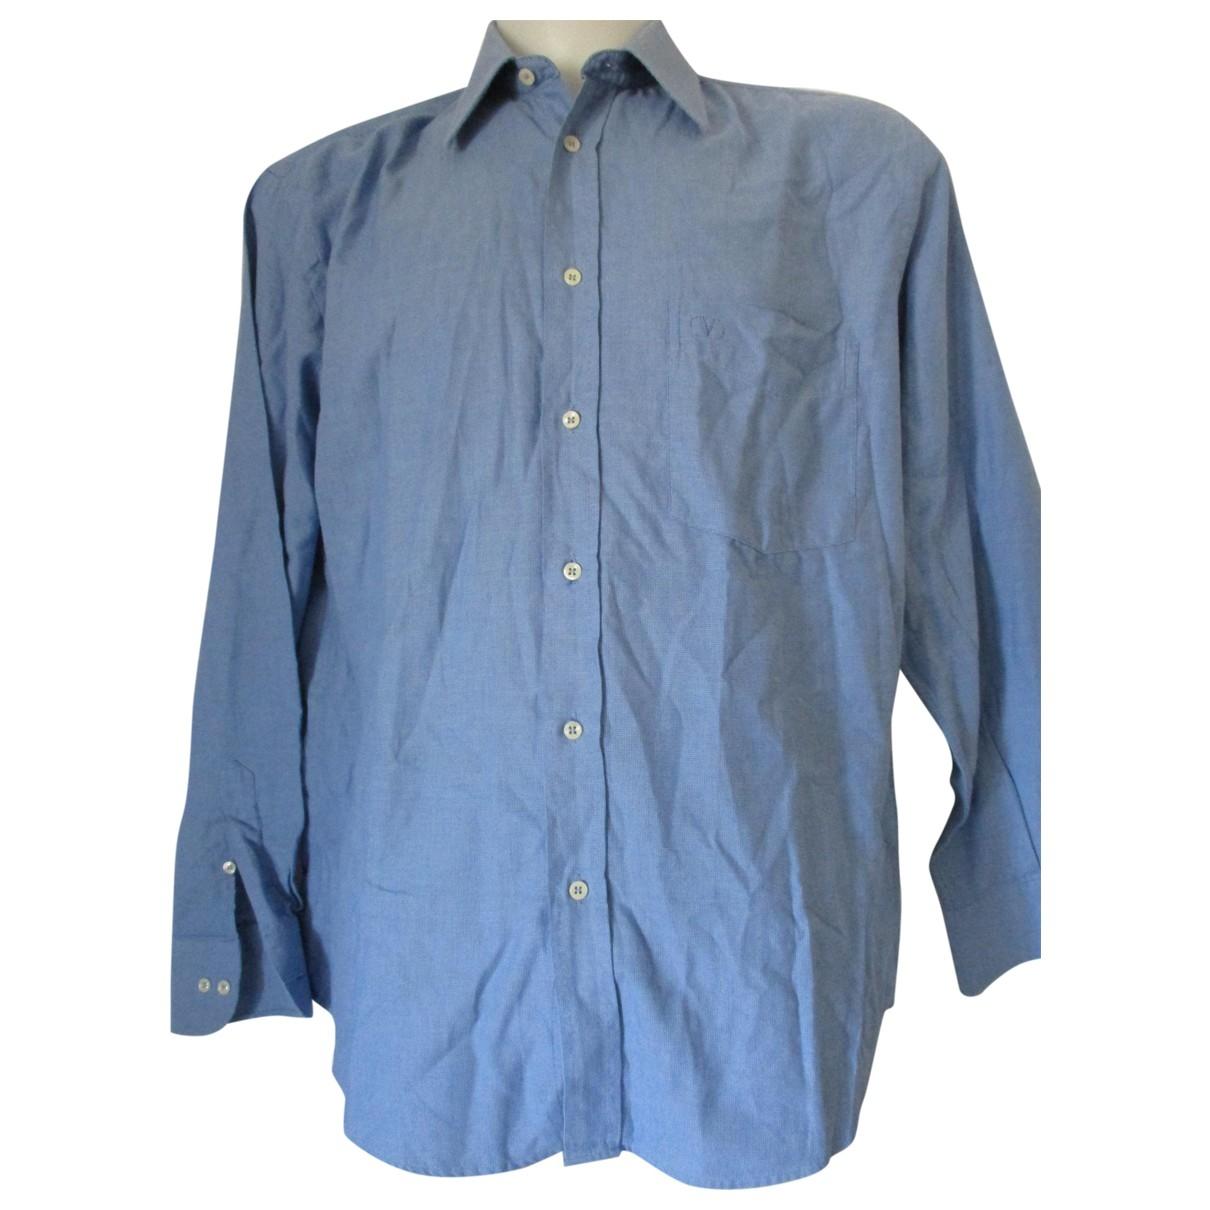 Valentino Garavani \N Blue Cotton Shirts for Men 42 EU (tour de cou / collar)